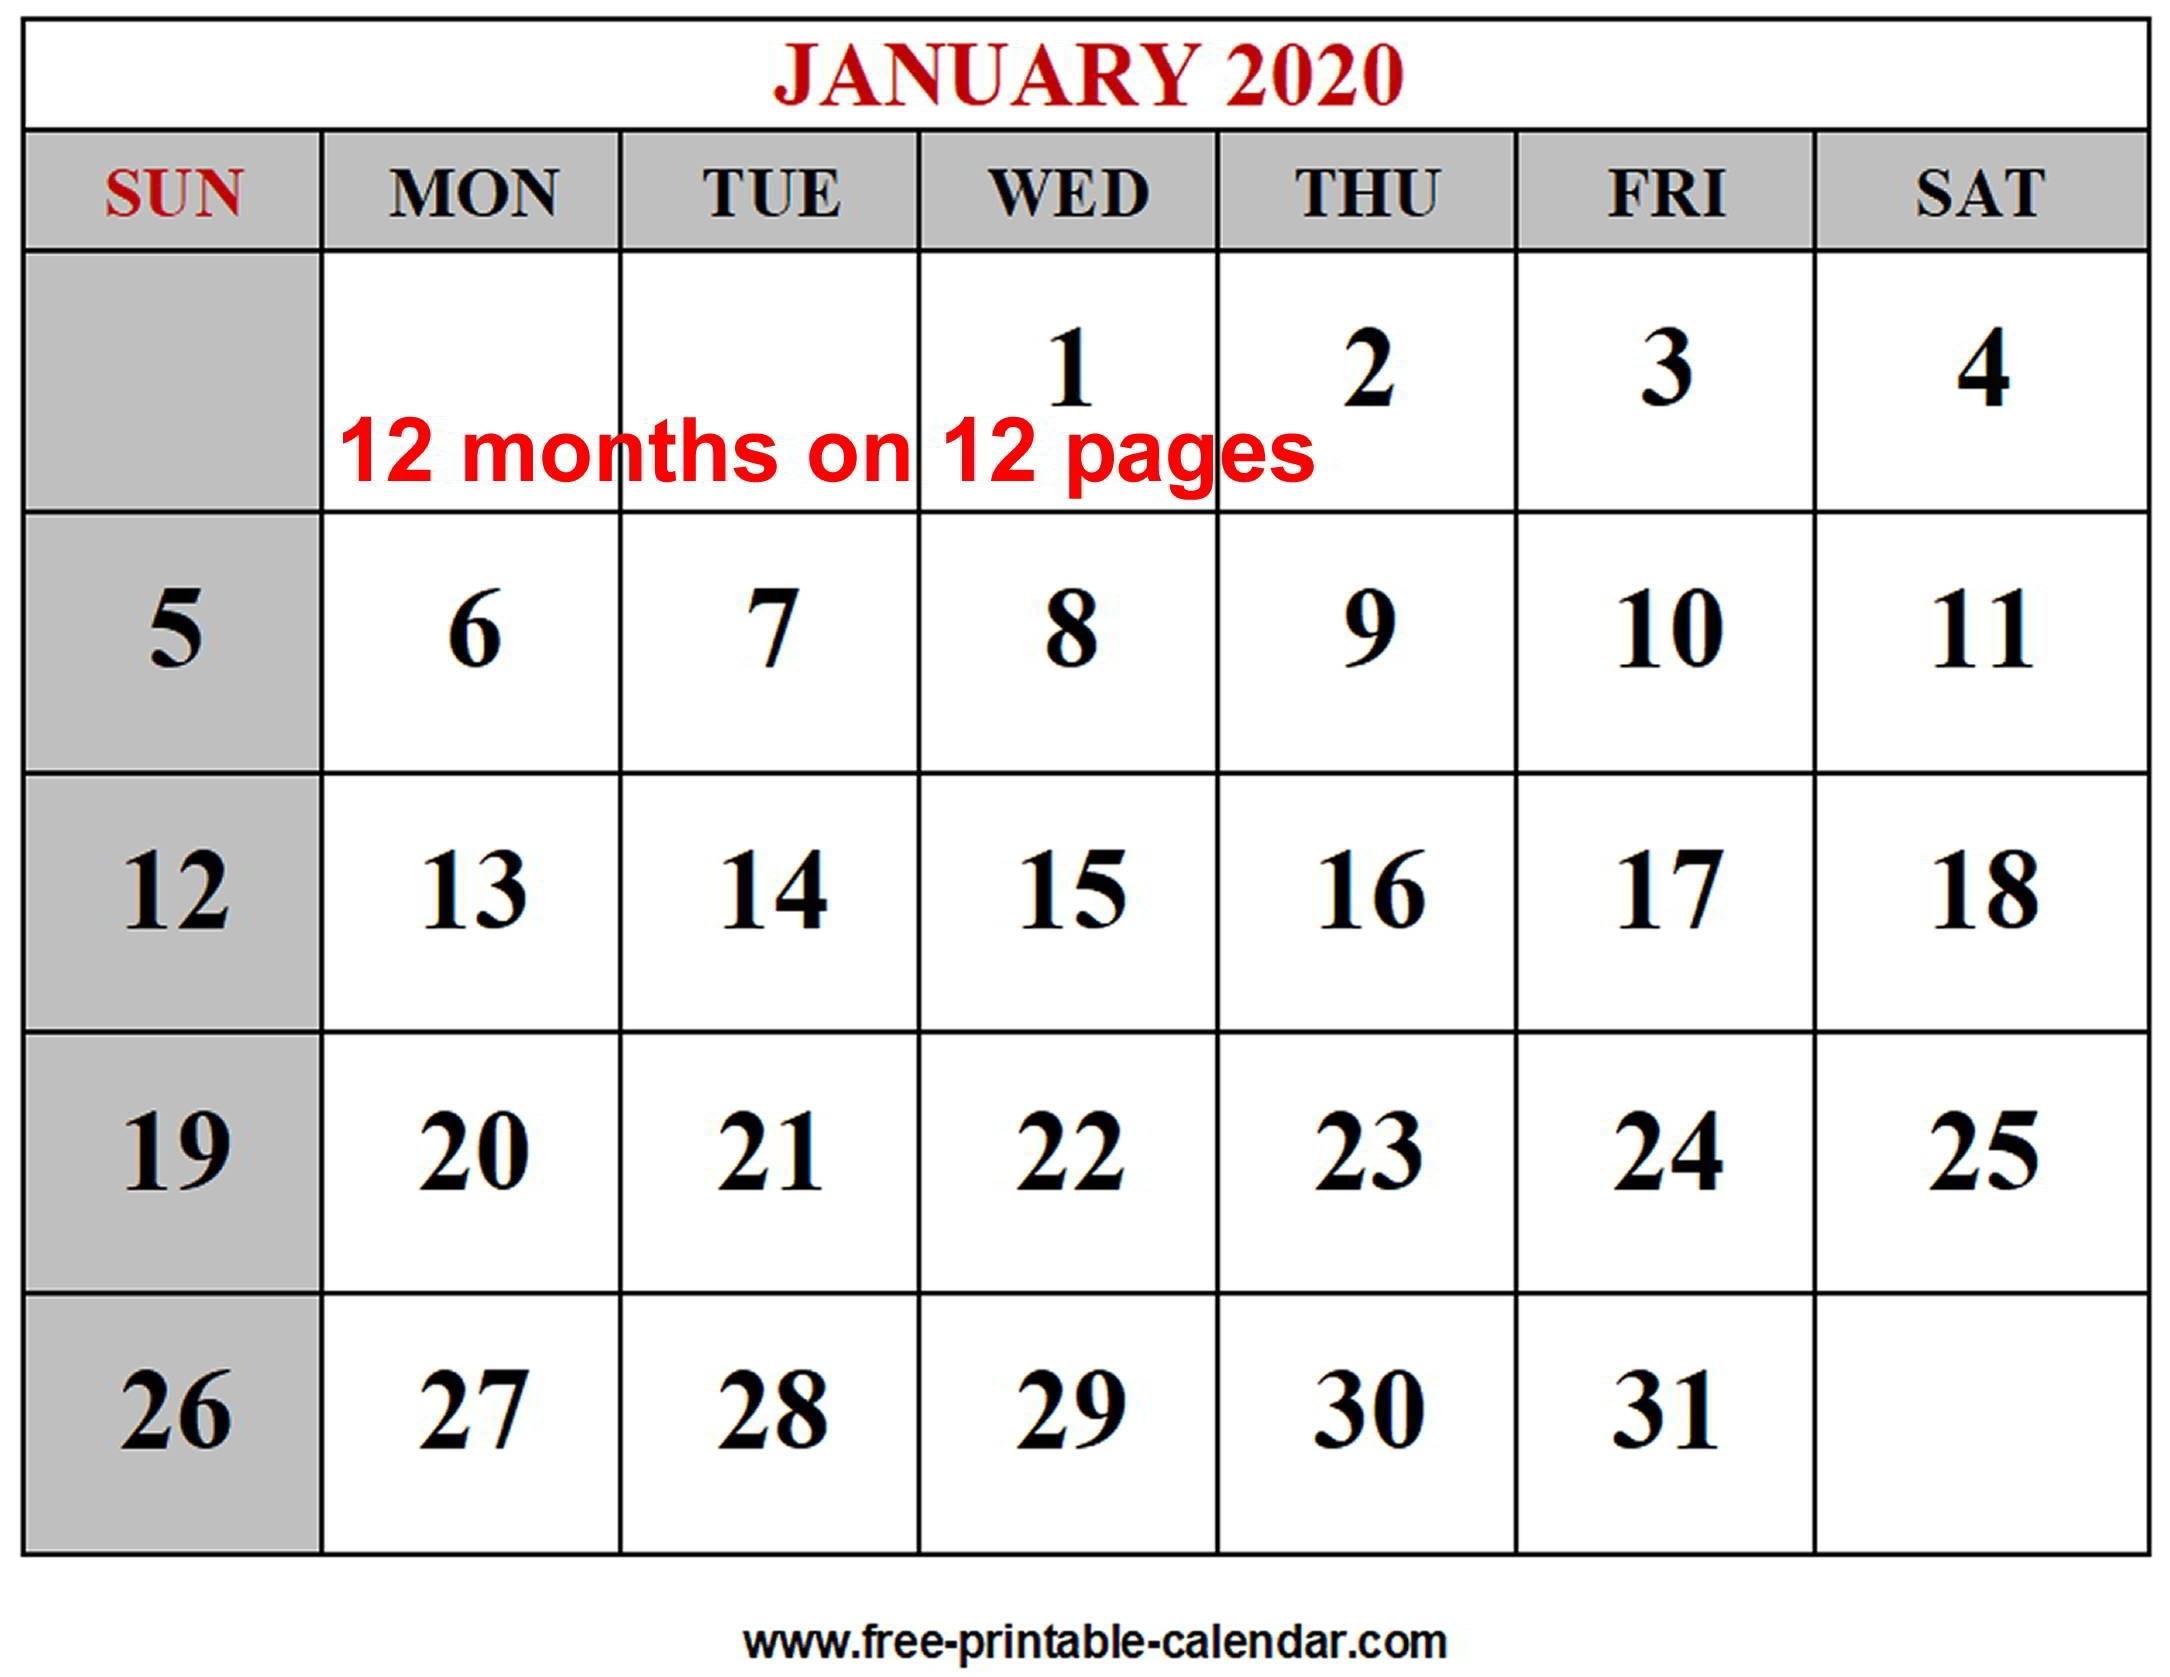 Year 2020 Calendar Templates – Free-Printable-Calendar-12